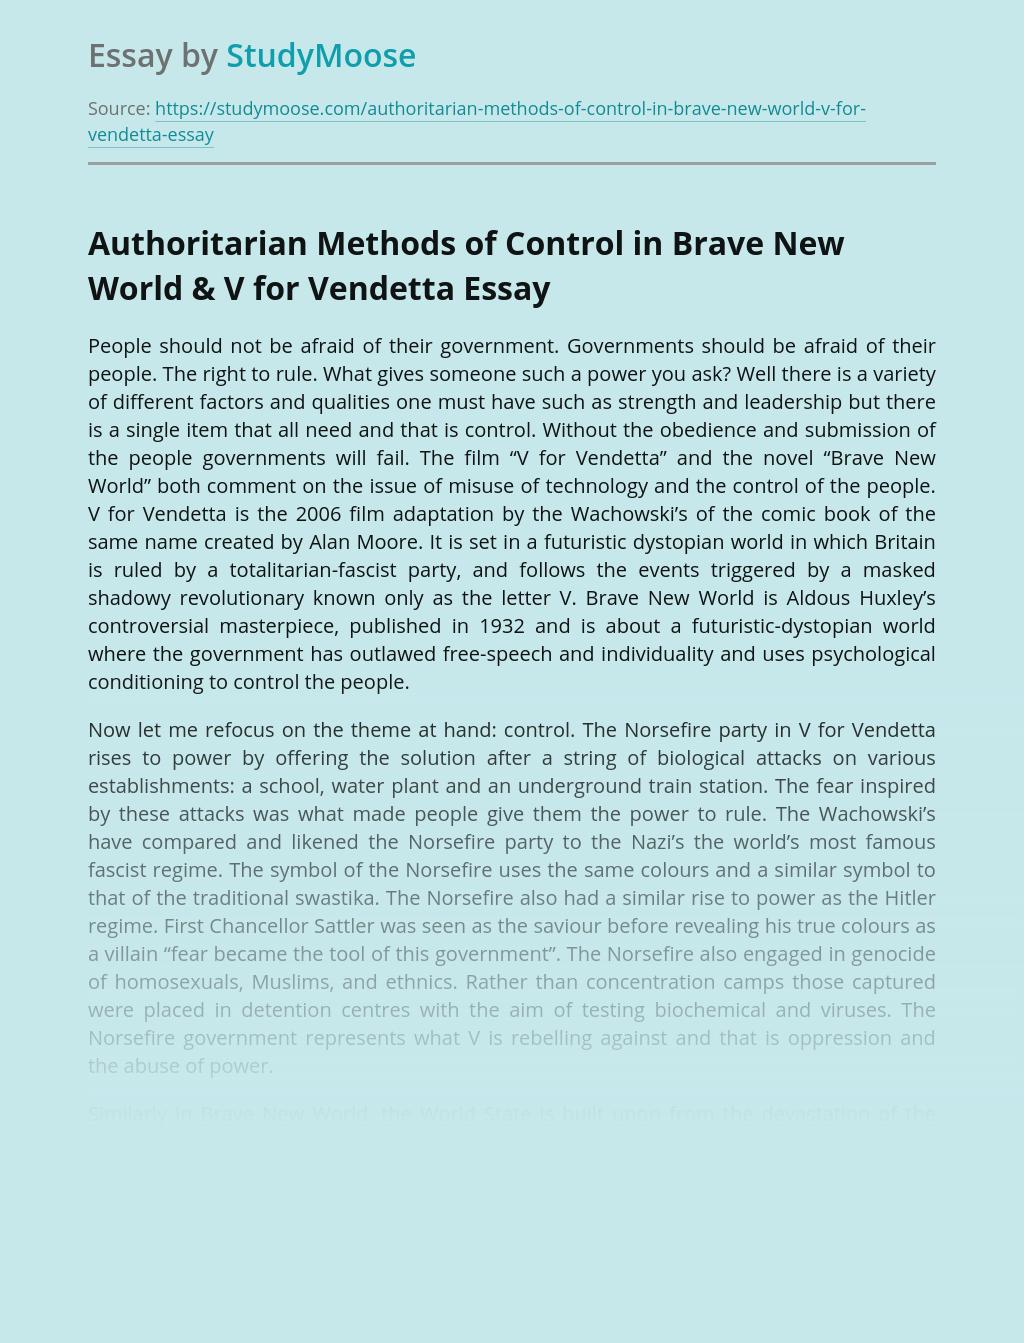 Authoritarian Methods of Control in Brave New World & V for Vendetta